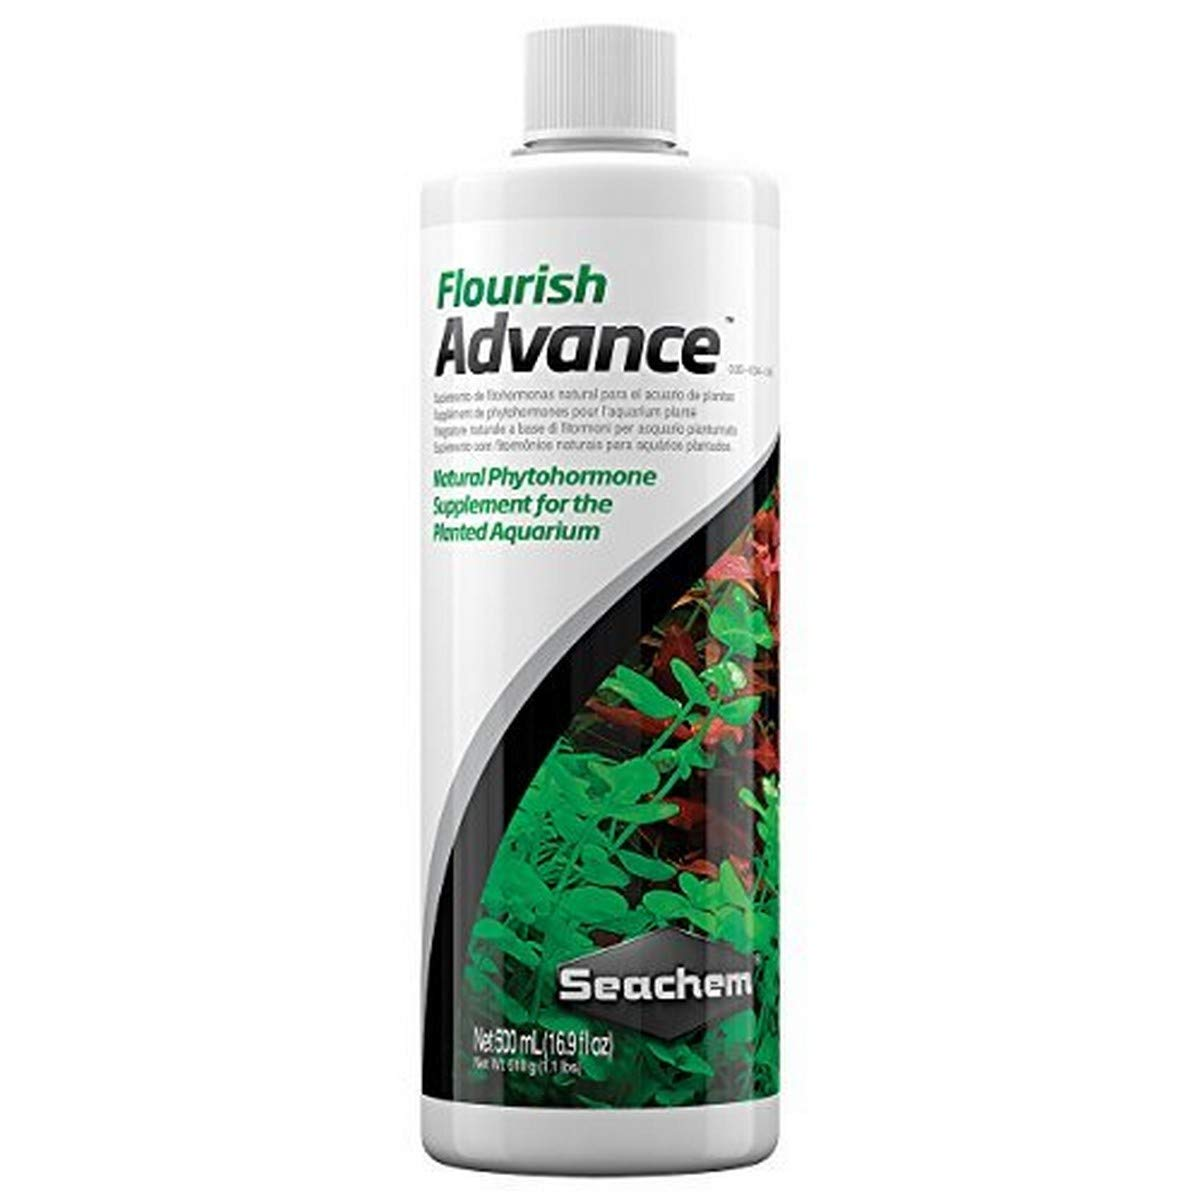 Seachem Flourish Advance Phytohormone Supplement, 500 ml